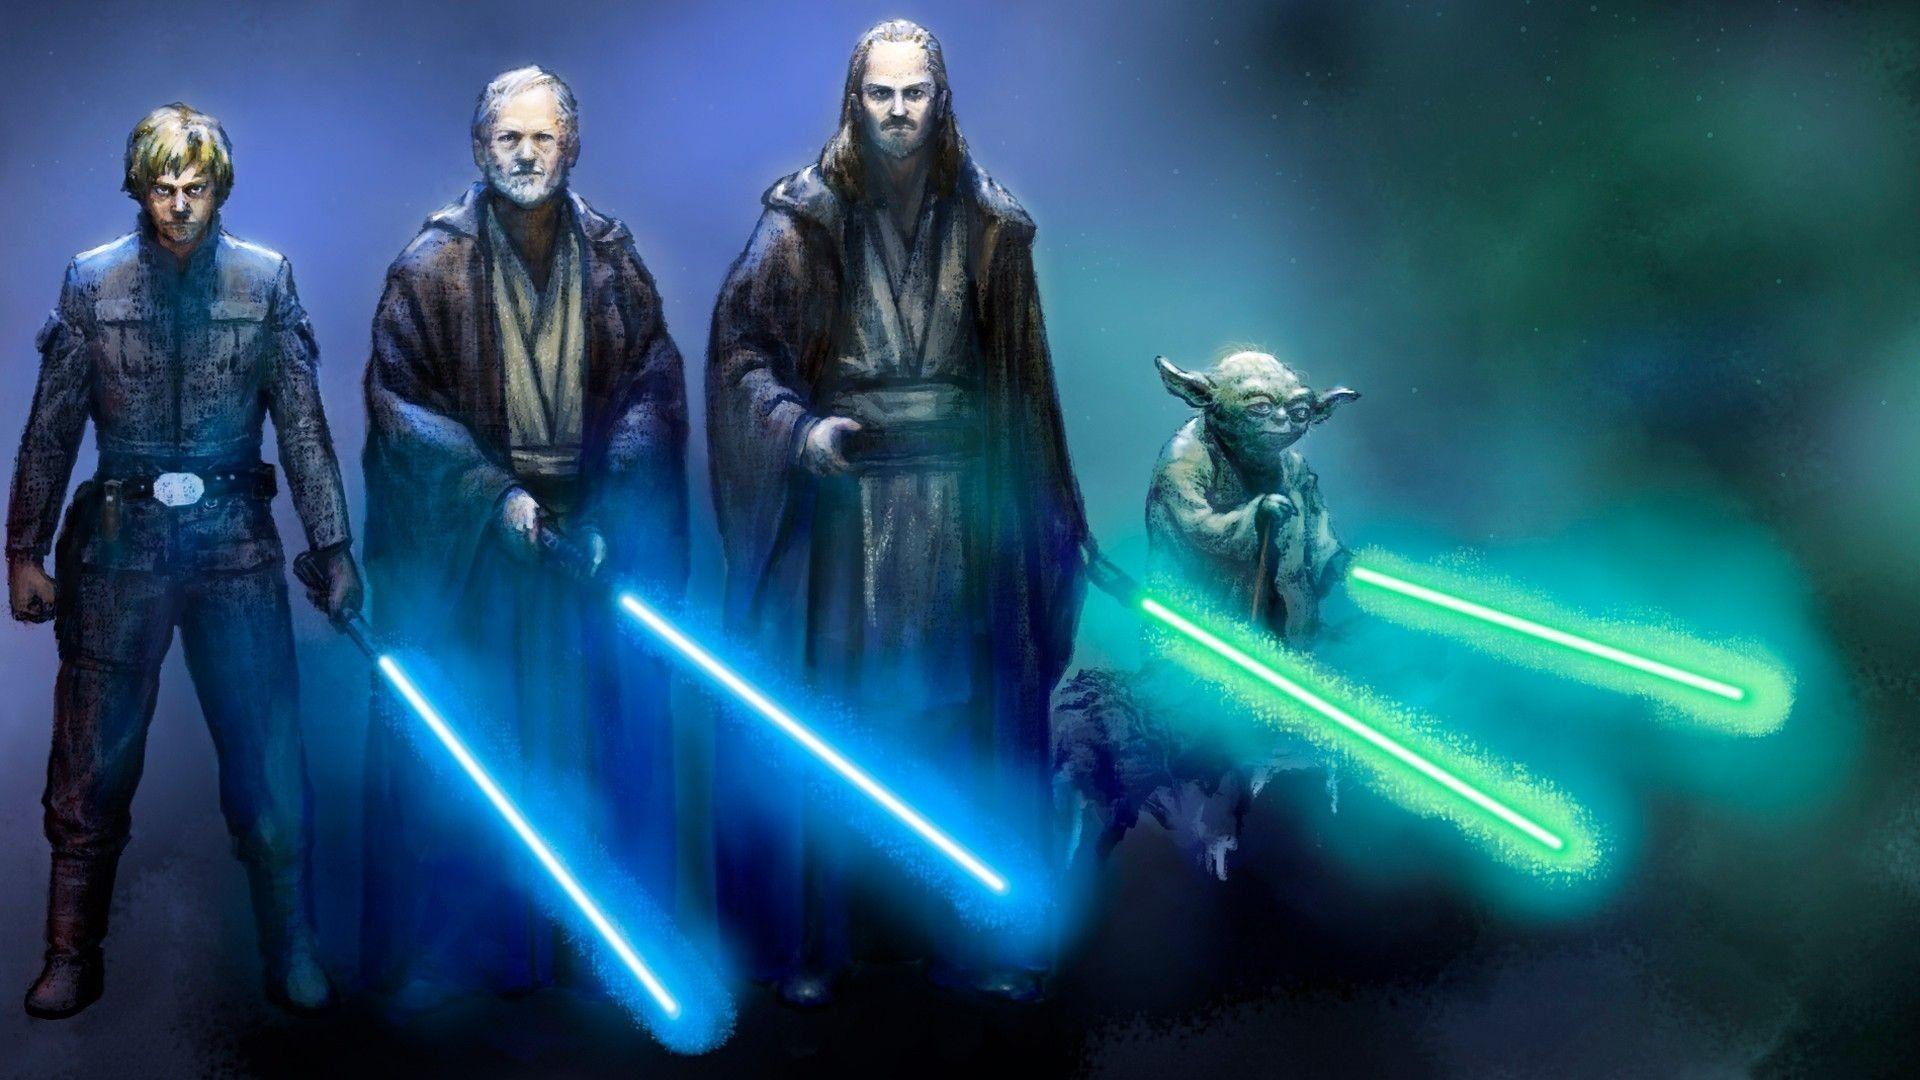 Star Wars Sith Wallpaper » WallDevil – Best free HD desktop and .